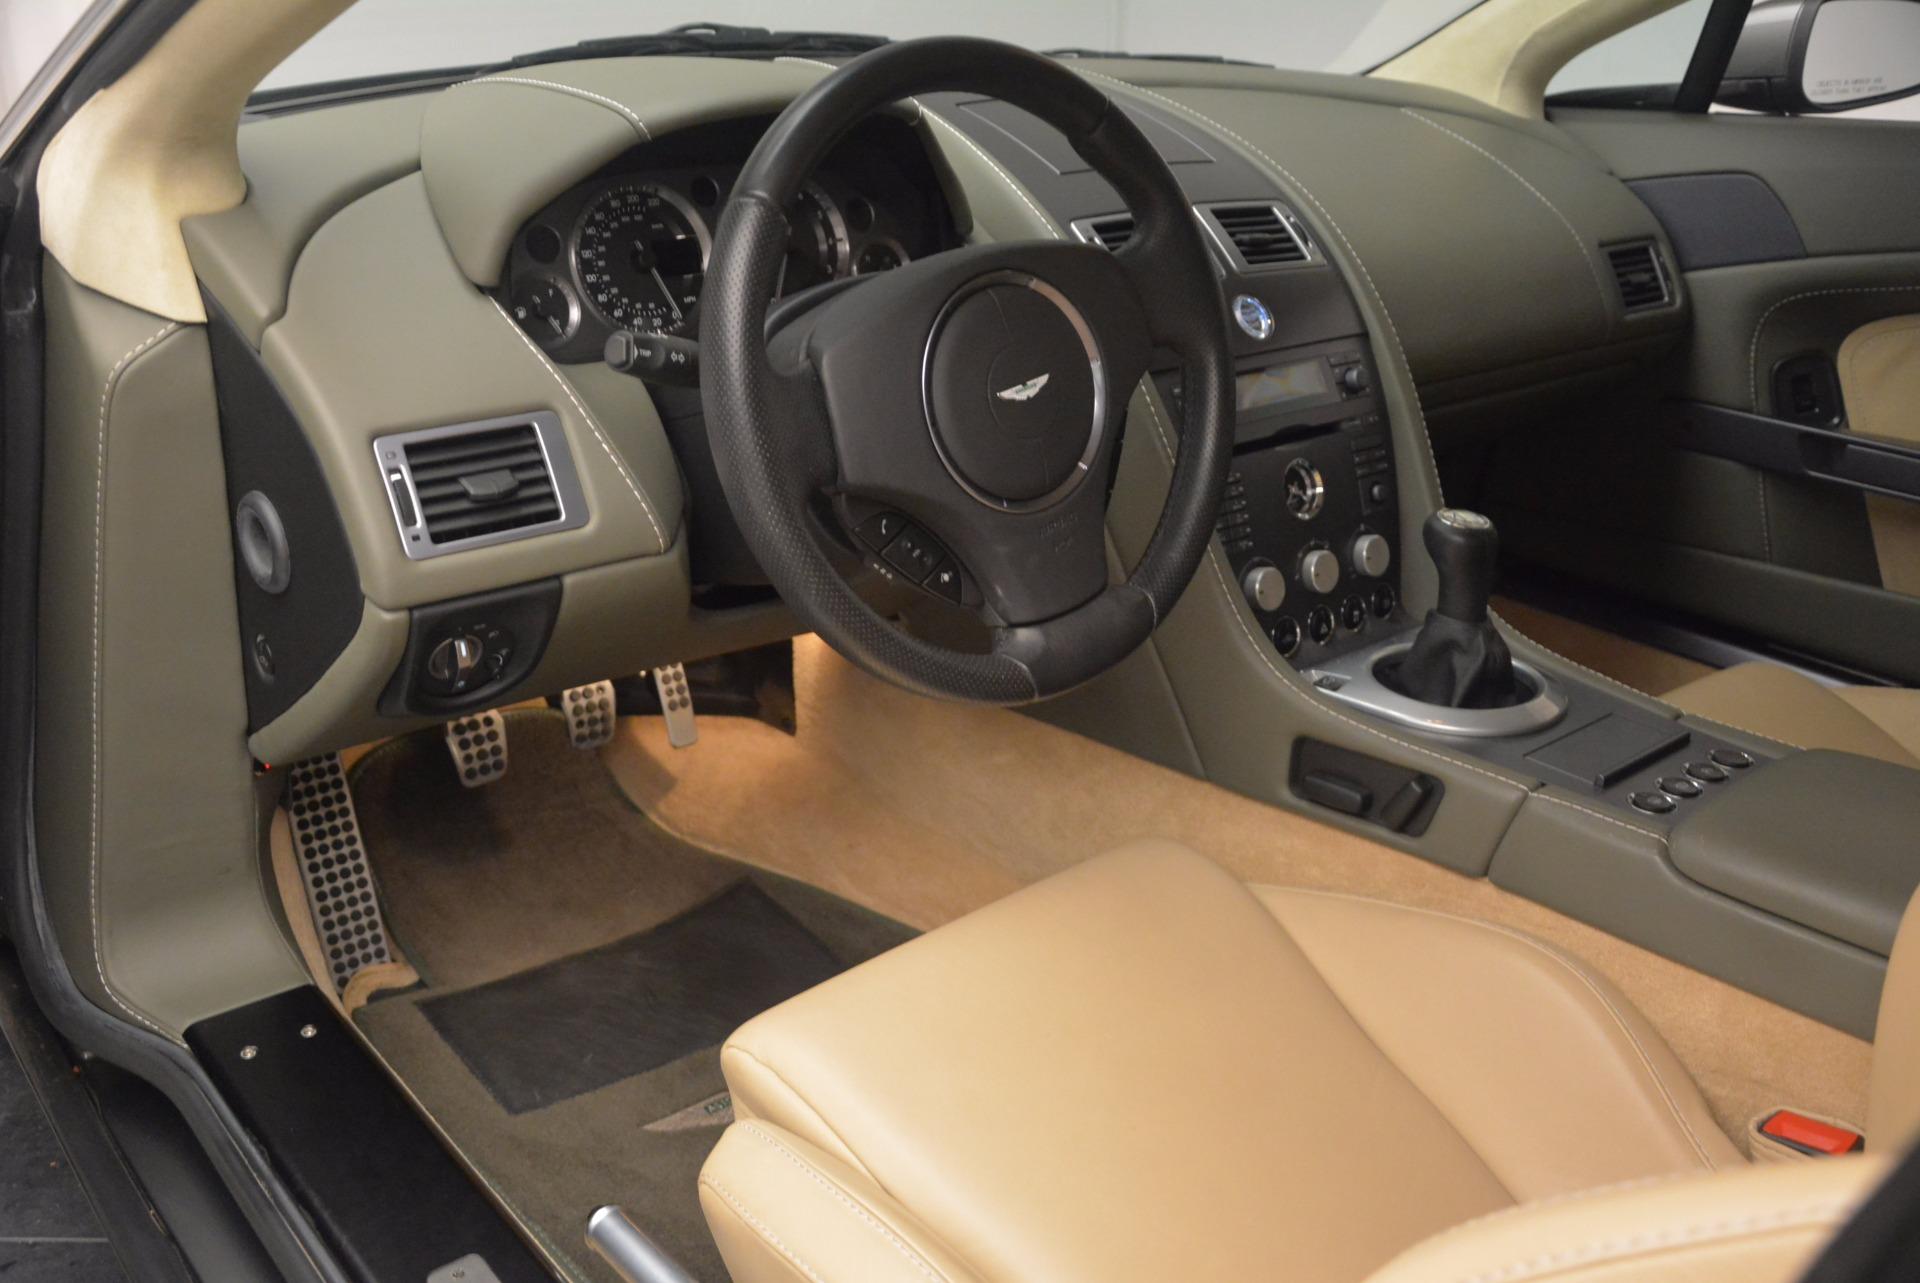 Used 2006 Aston Martin V8 Vantage  For Sale In Westport, CT 1658_p14